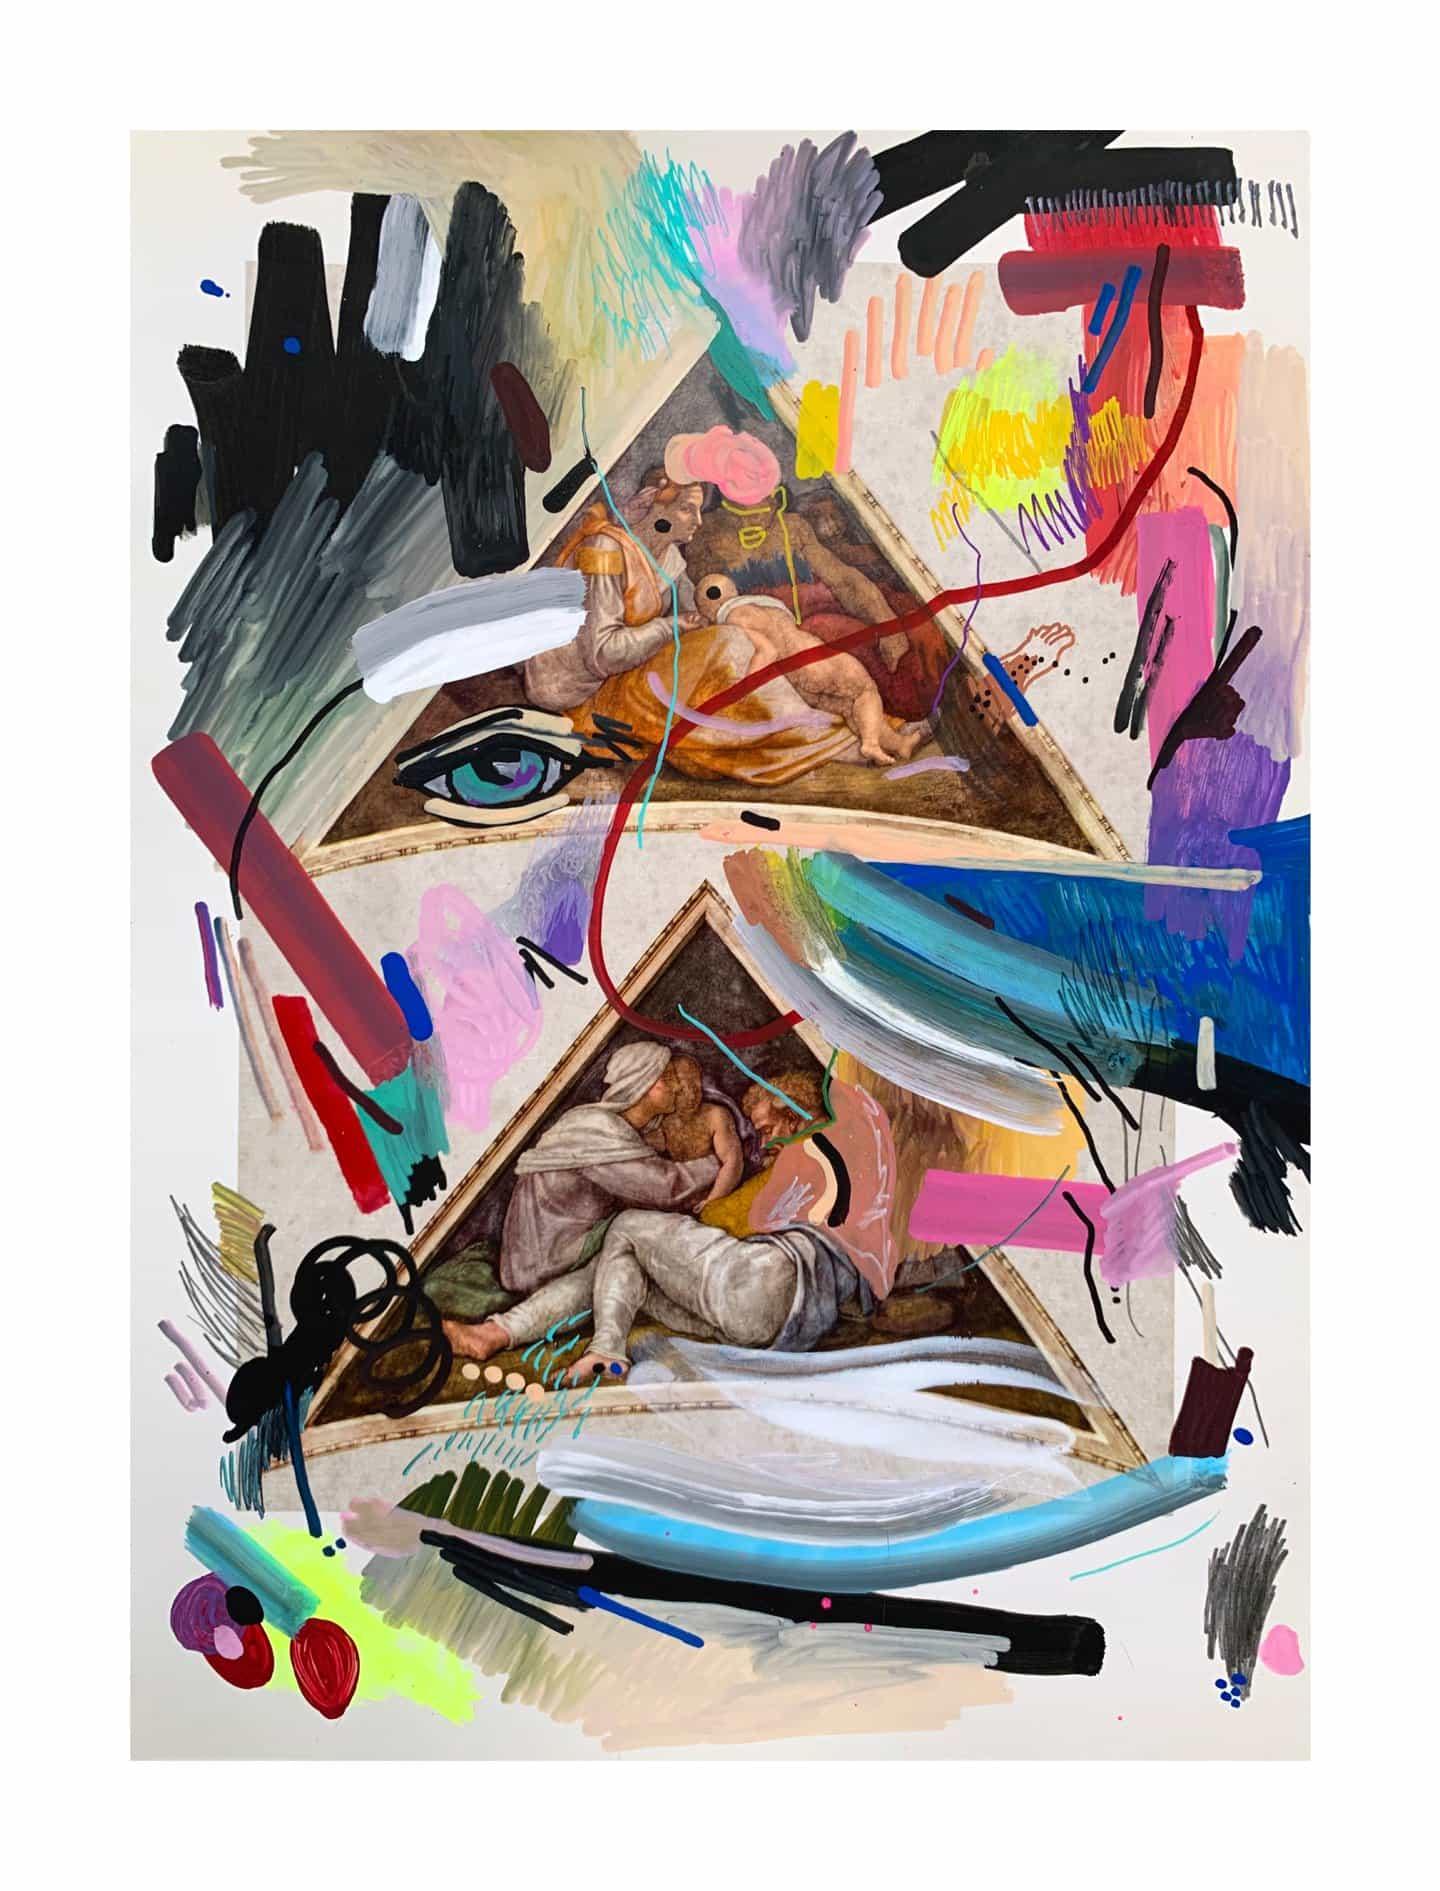 Brian Kenny: Eye Feel You, técnica mixta sobre papel encontrado, 13 3⁄4 x 10 pulgadas Copyright © Brian Kenny, 2021)